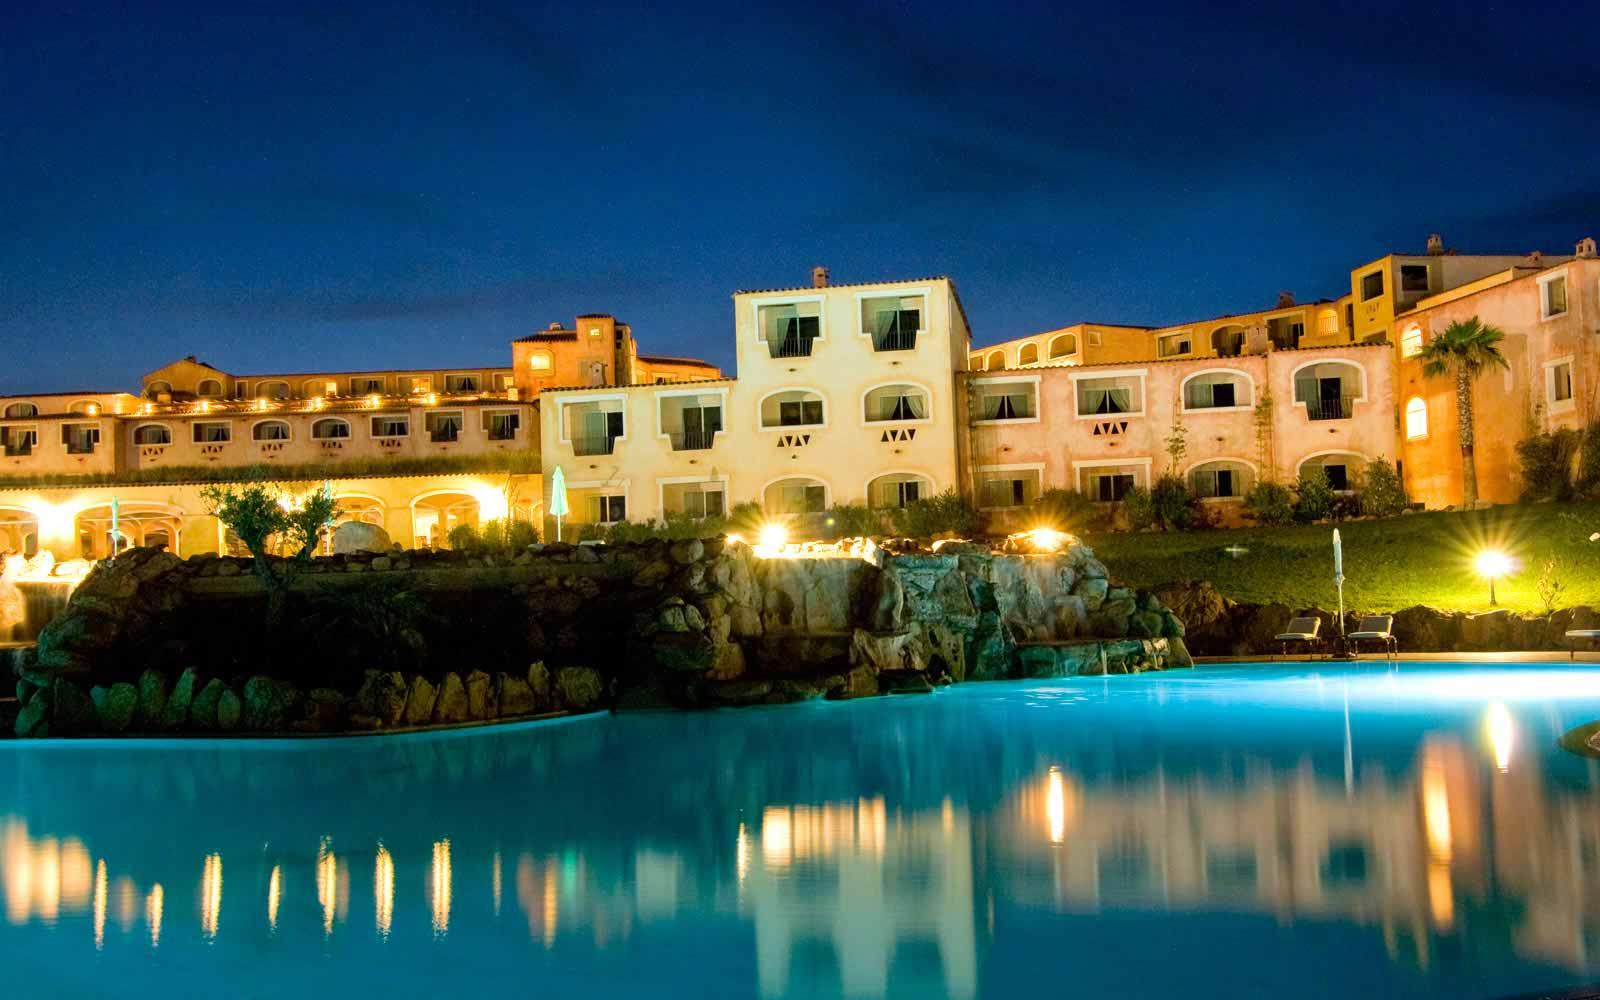 Night view of Colonna Resort